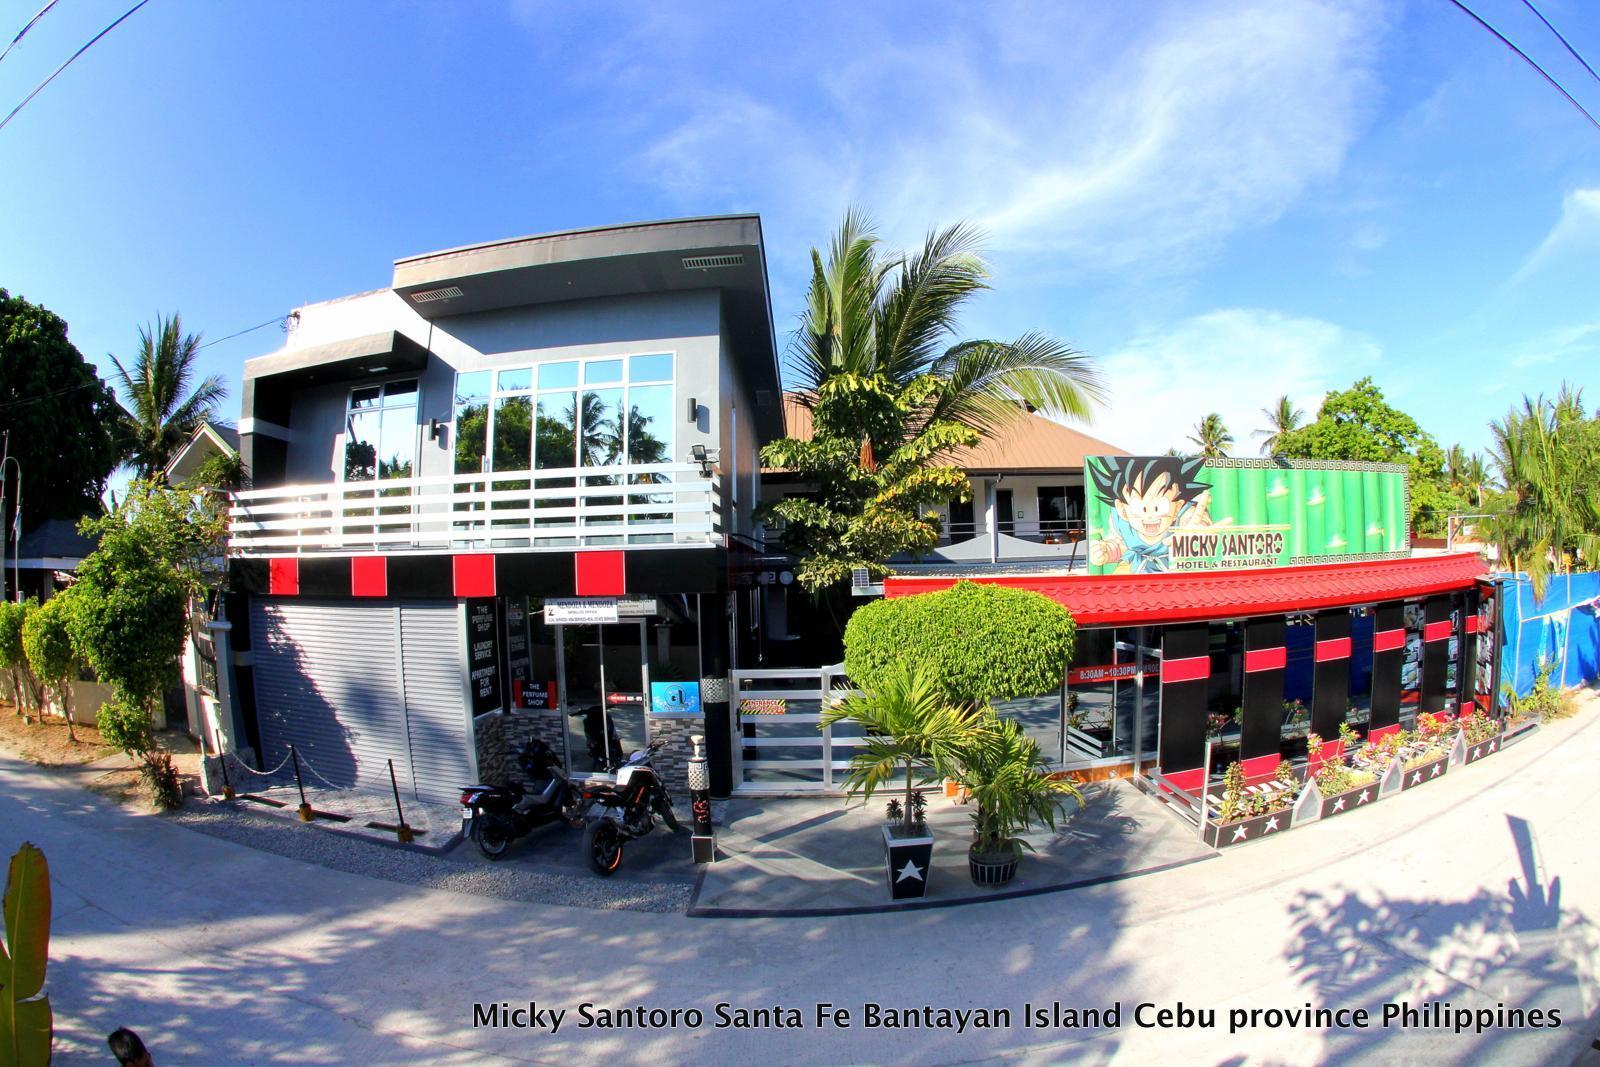 Micky Santoro Hotel And Restaurant